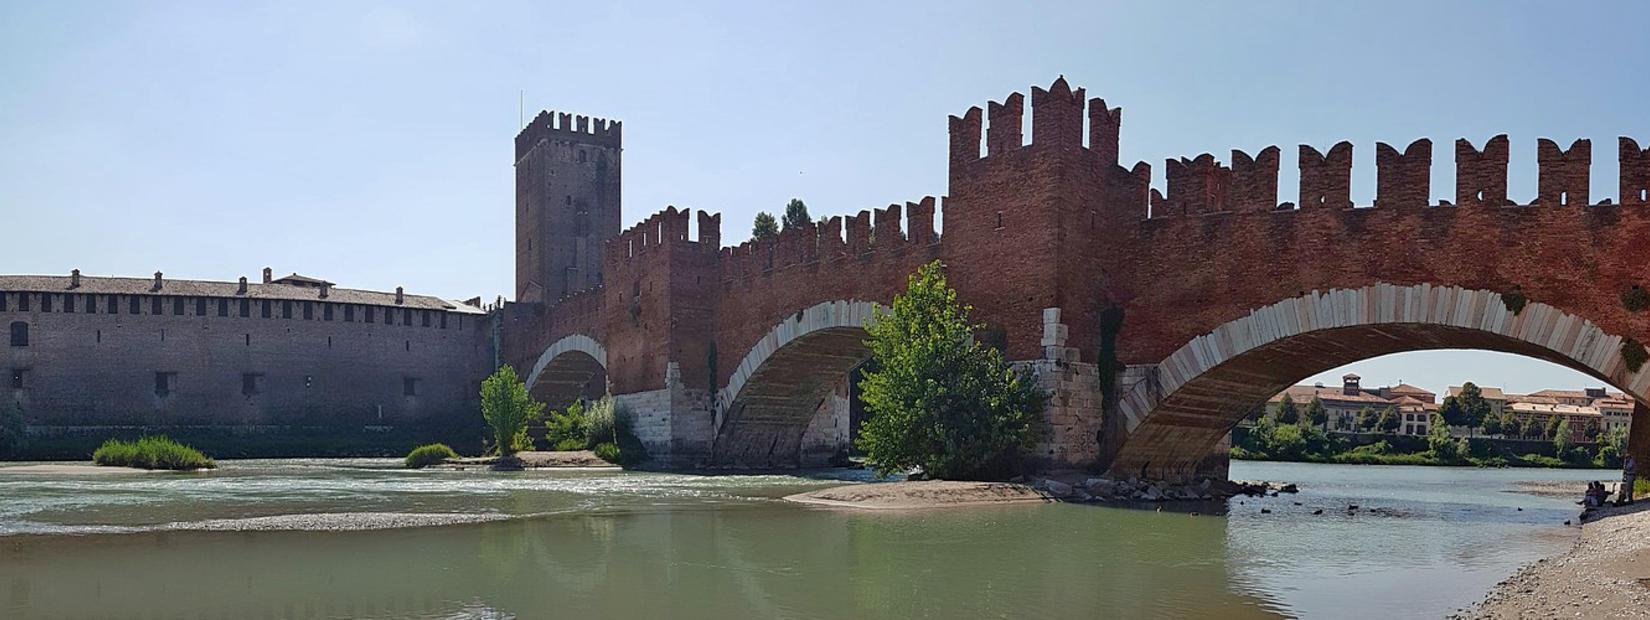 Verona, Castel Vecchio